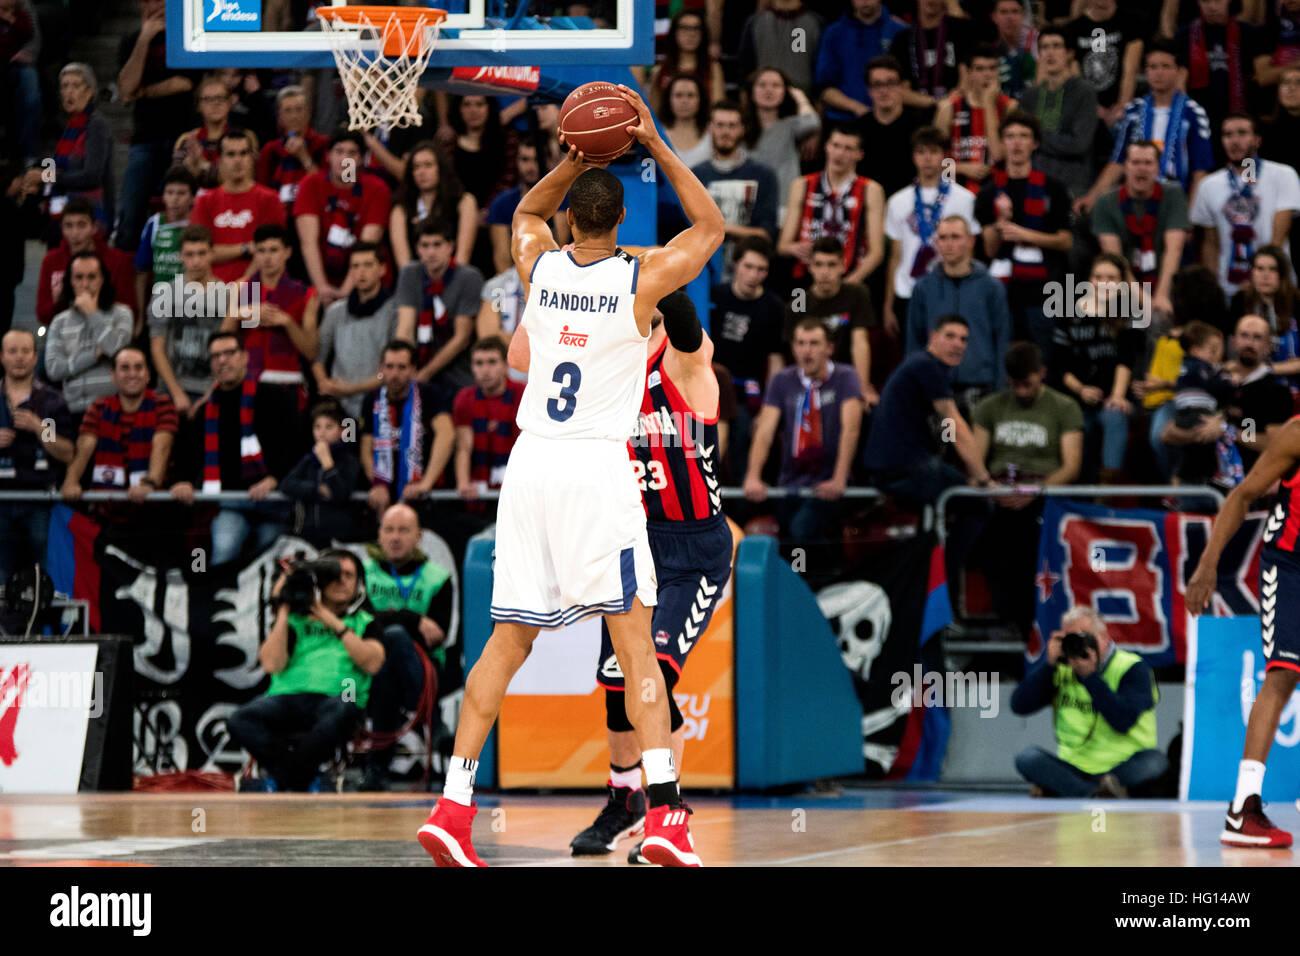 Vitoria, Espagne. 3 janvier, 2017. Anthony Randolph (Real Madrid) tire la balle pendant le match de basket-ball Photo Stock